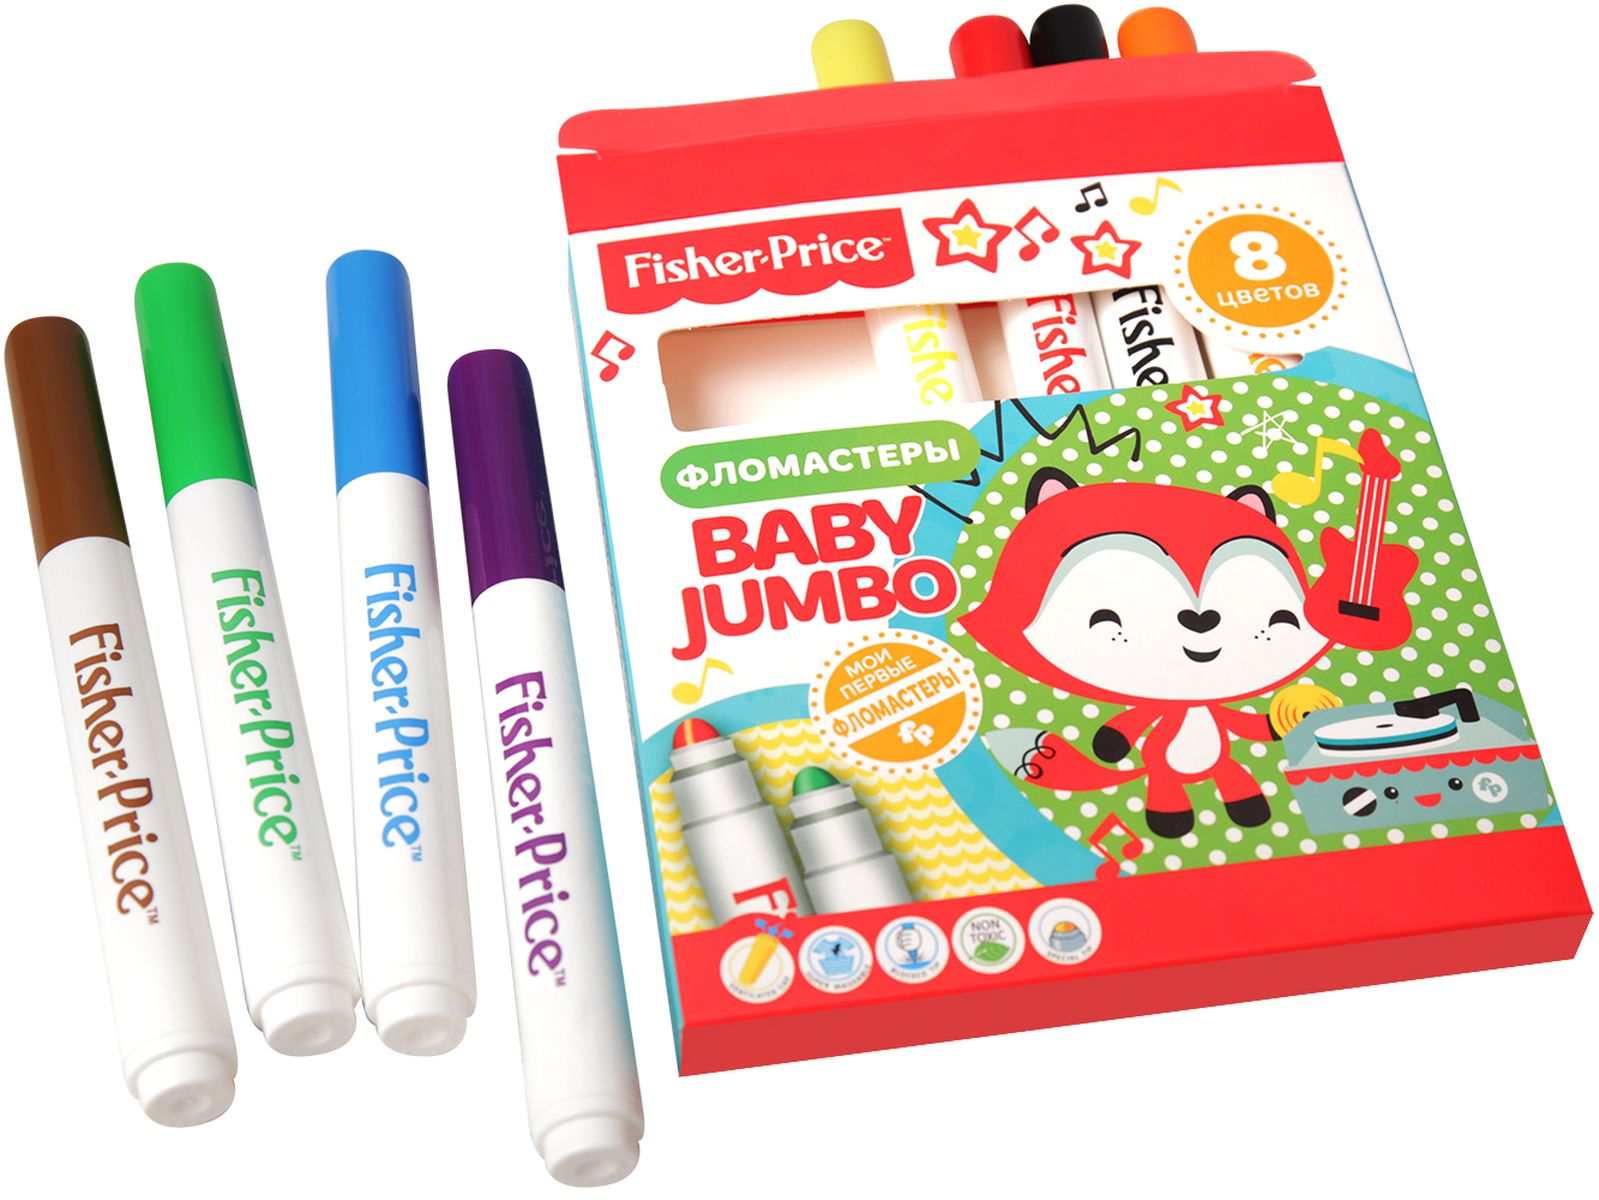 Mattel Набор детских фломастеров Baby Jumbo Mattel Fisher Price 8 цветов -  Фломастеры